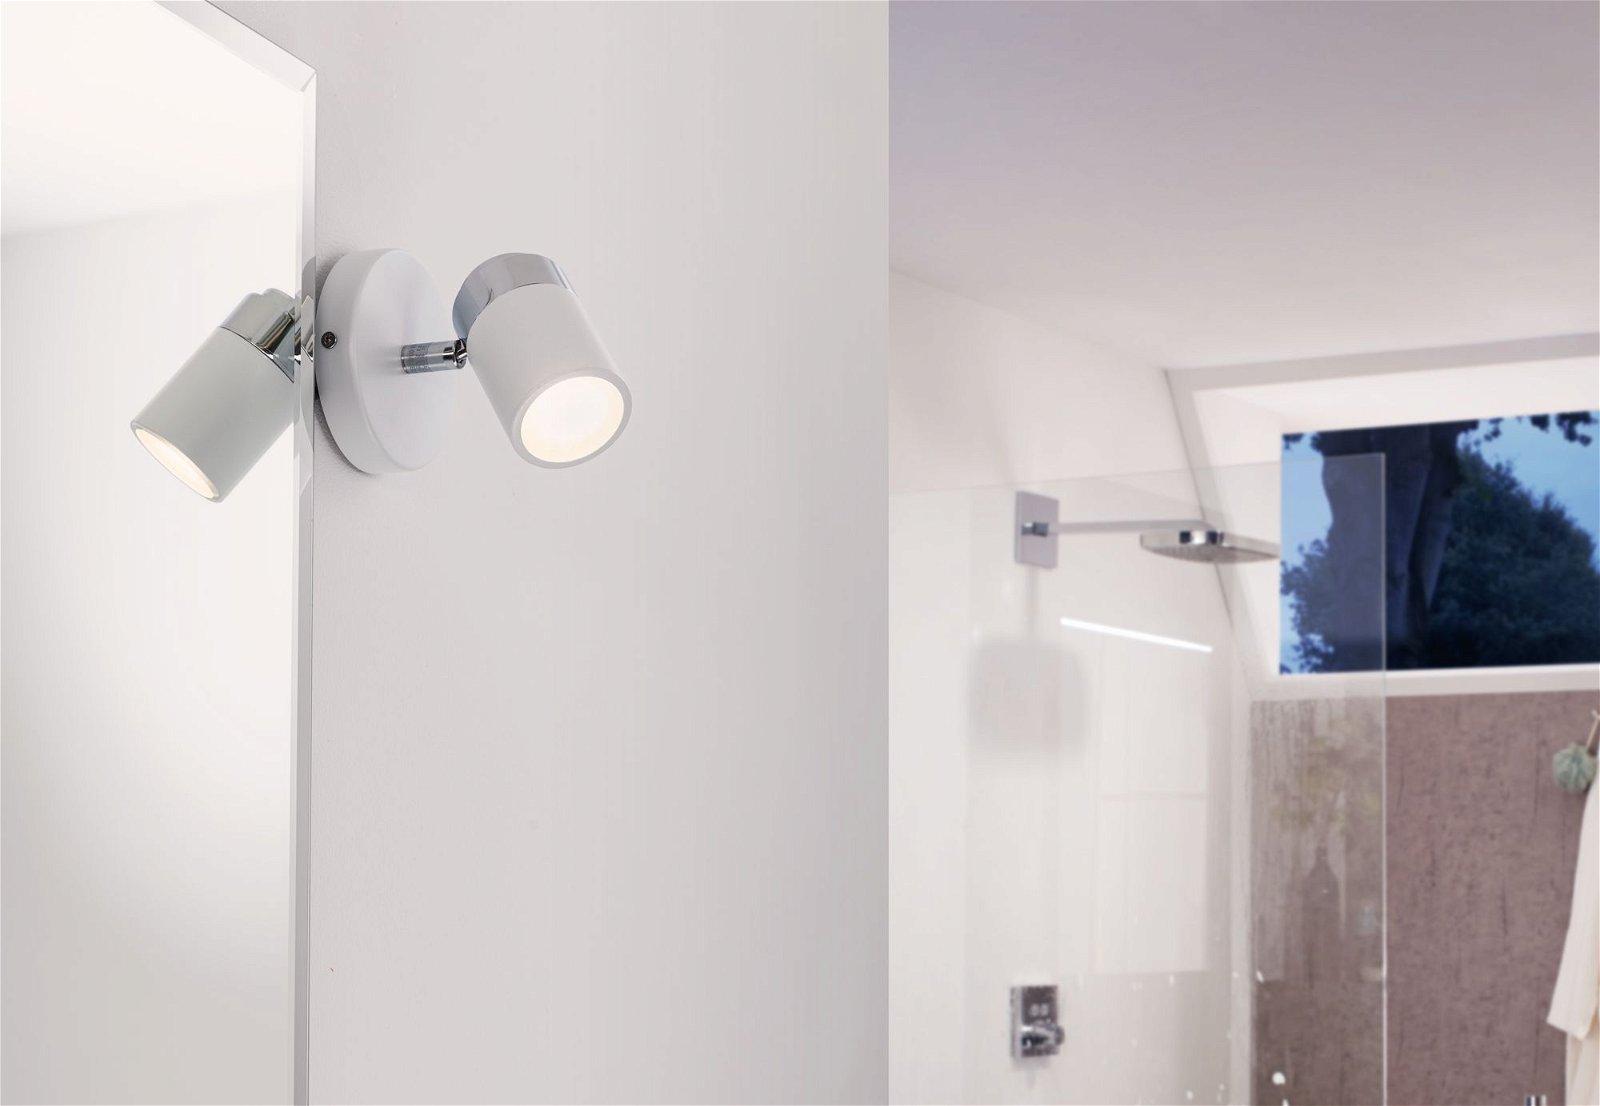 Ceiling spotlights Zyli IP44 GU10 230V max. 10W White/Chrome